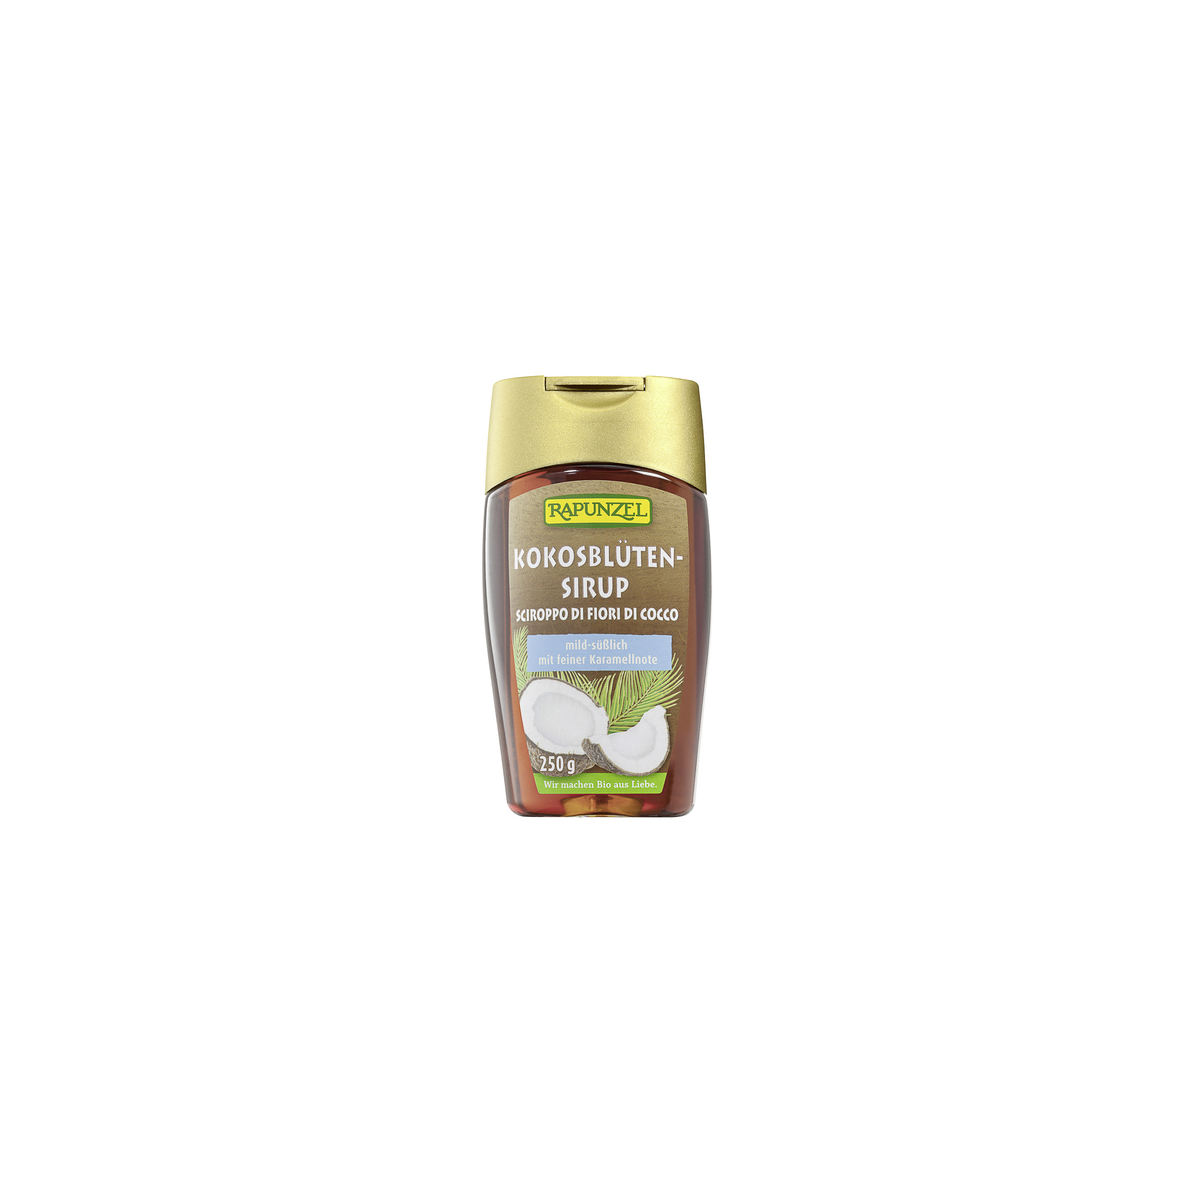 Kokosblüten-Sirup Flasche 250 ml/Plastik Einweg - Rapunzel